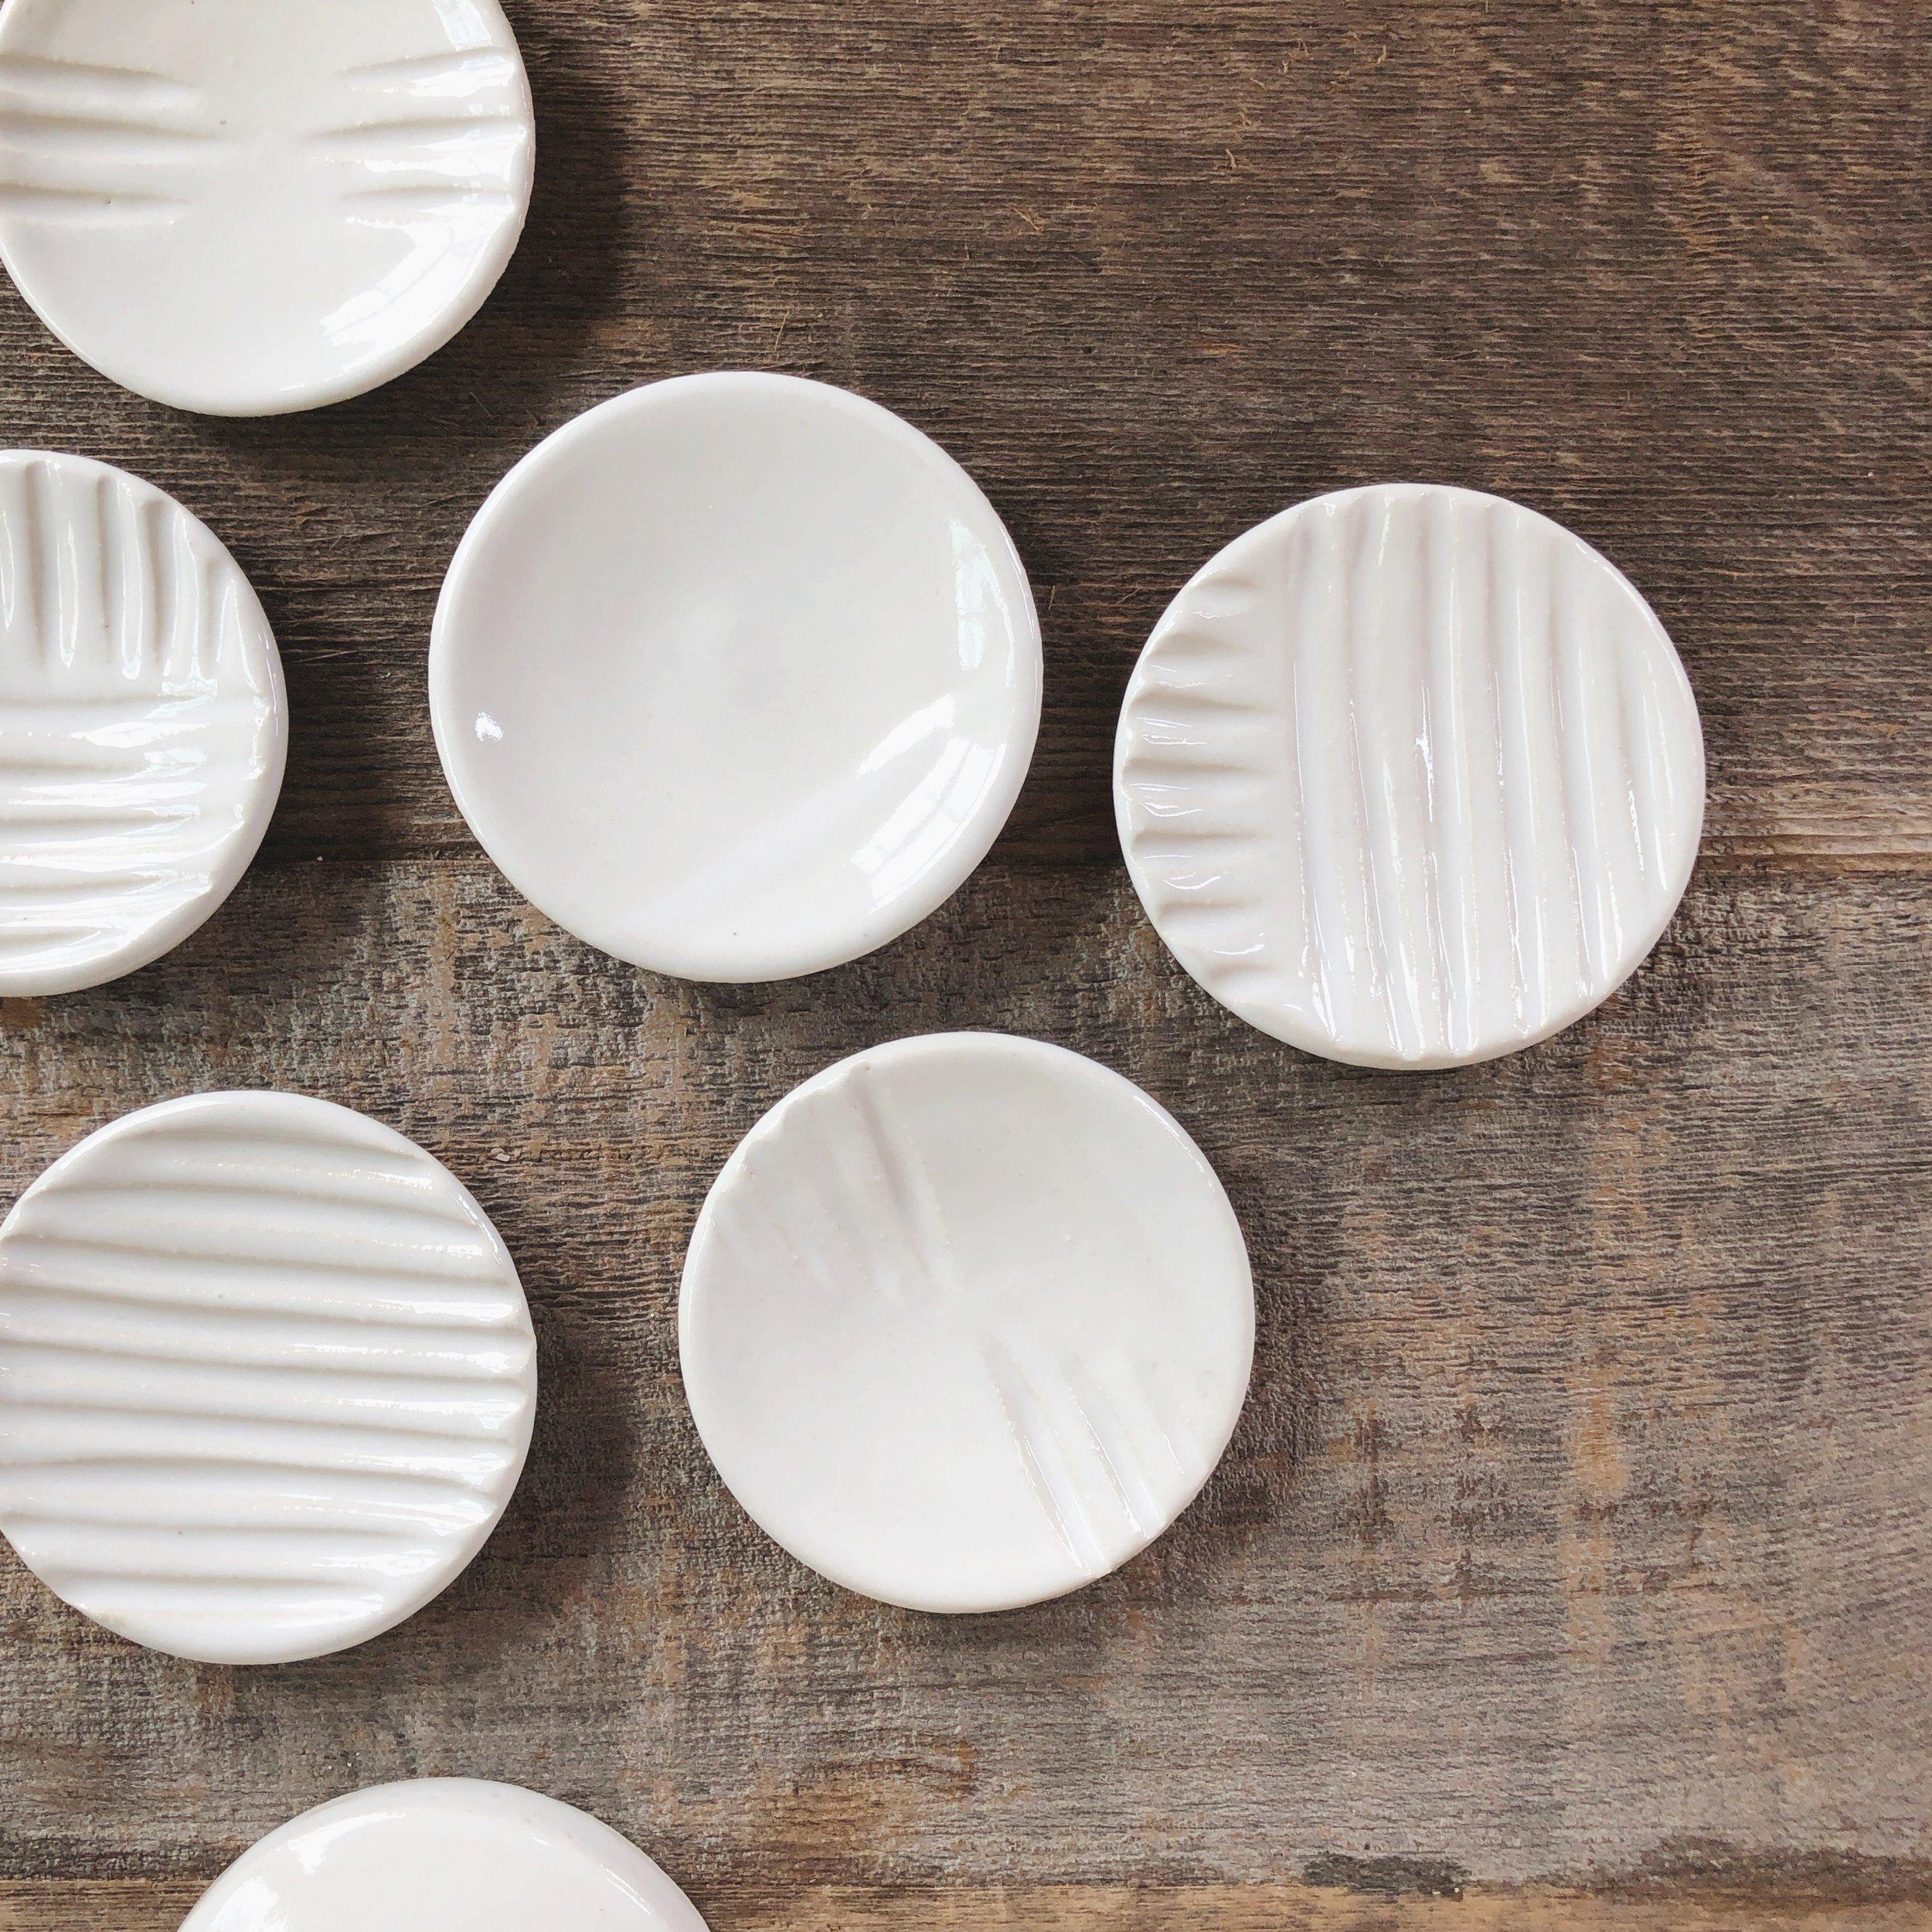 carved_porcelain_ring_dishes_javelinaranch